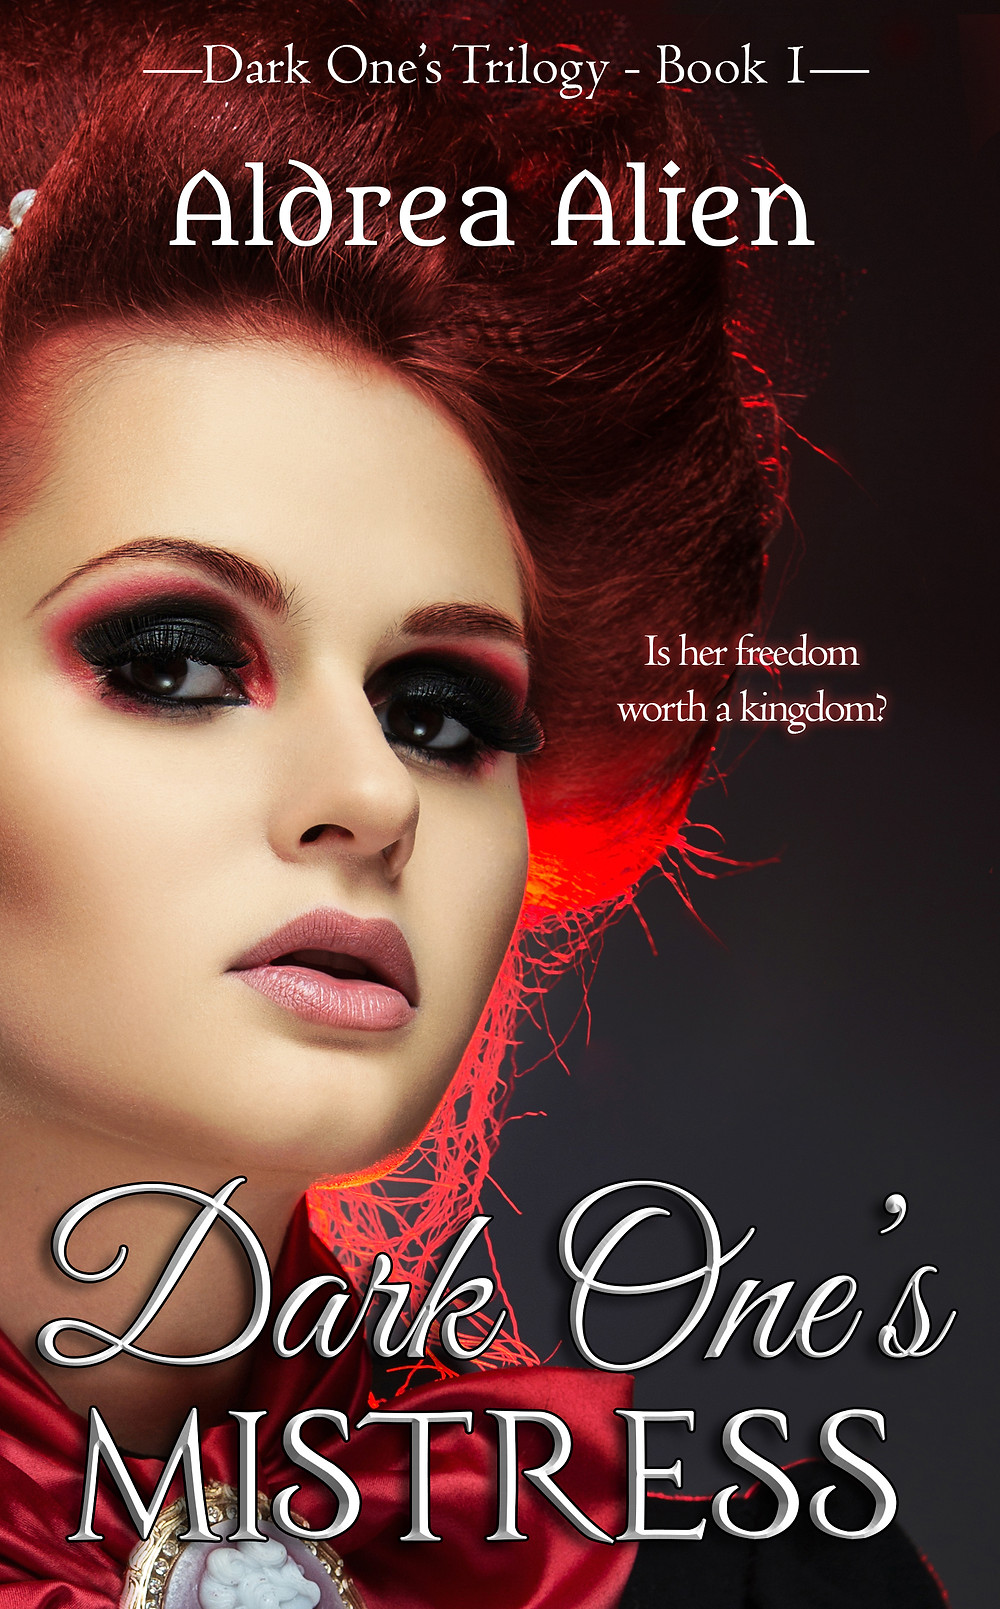 Dark One's Mistress